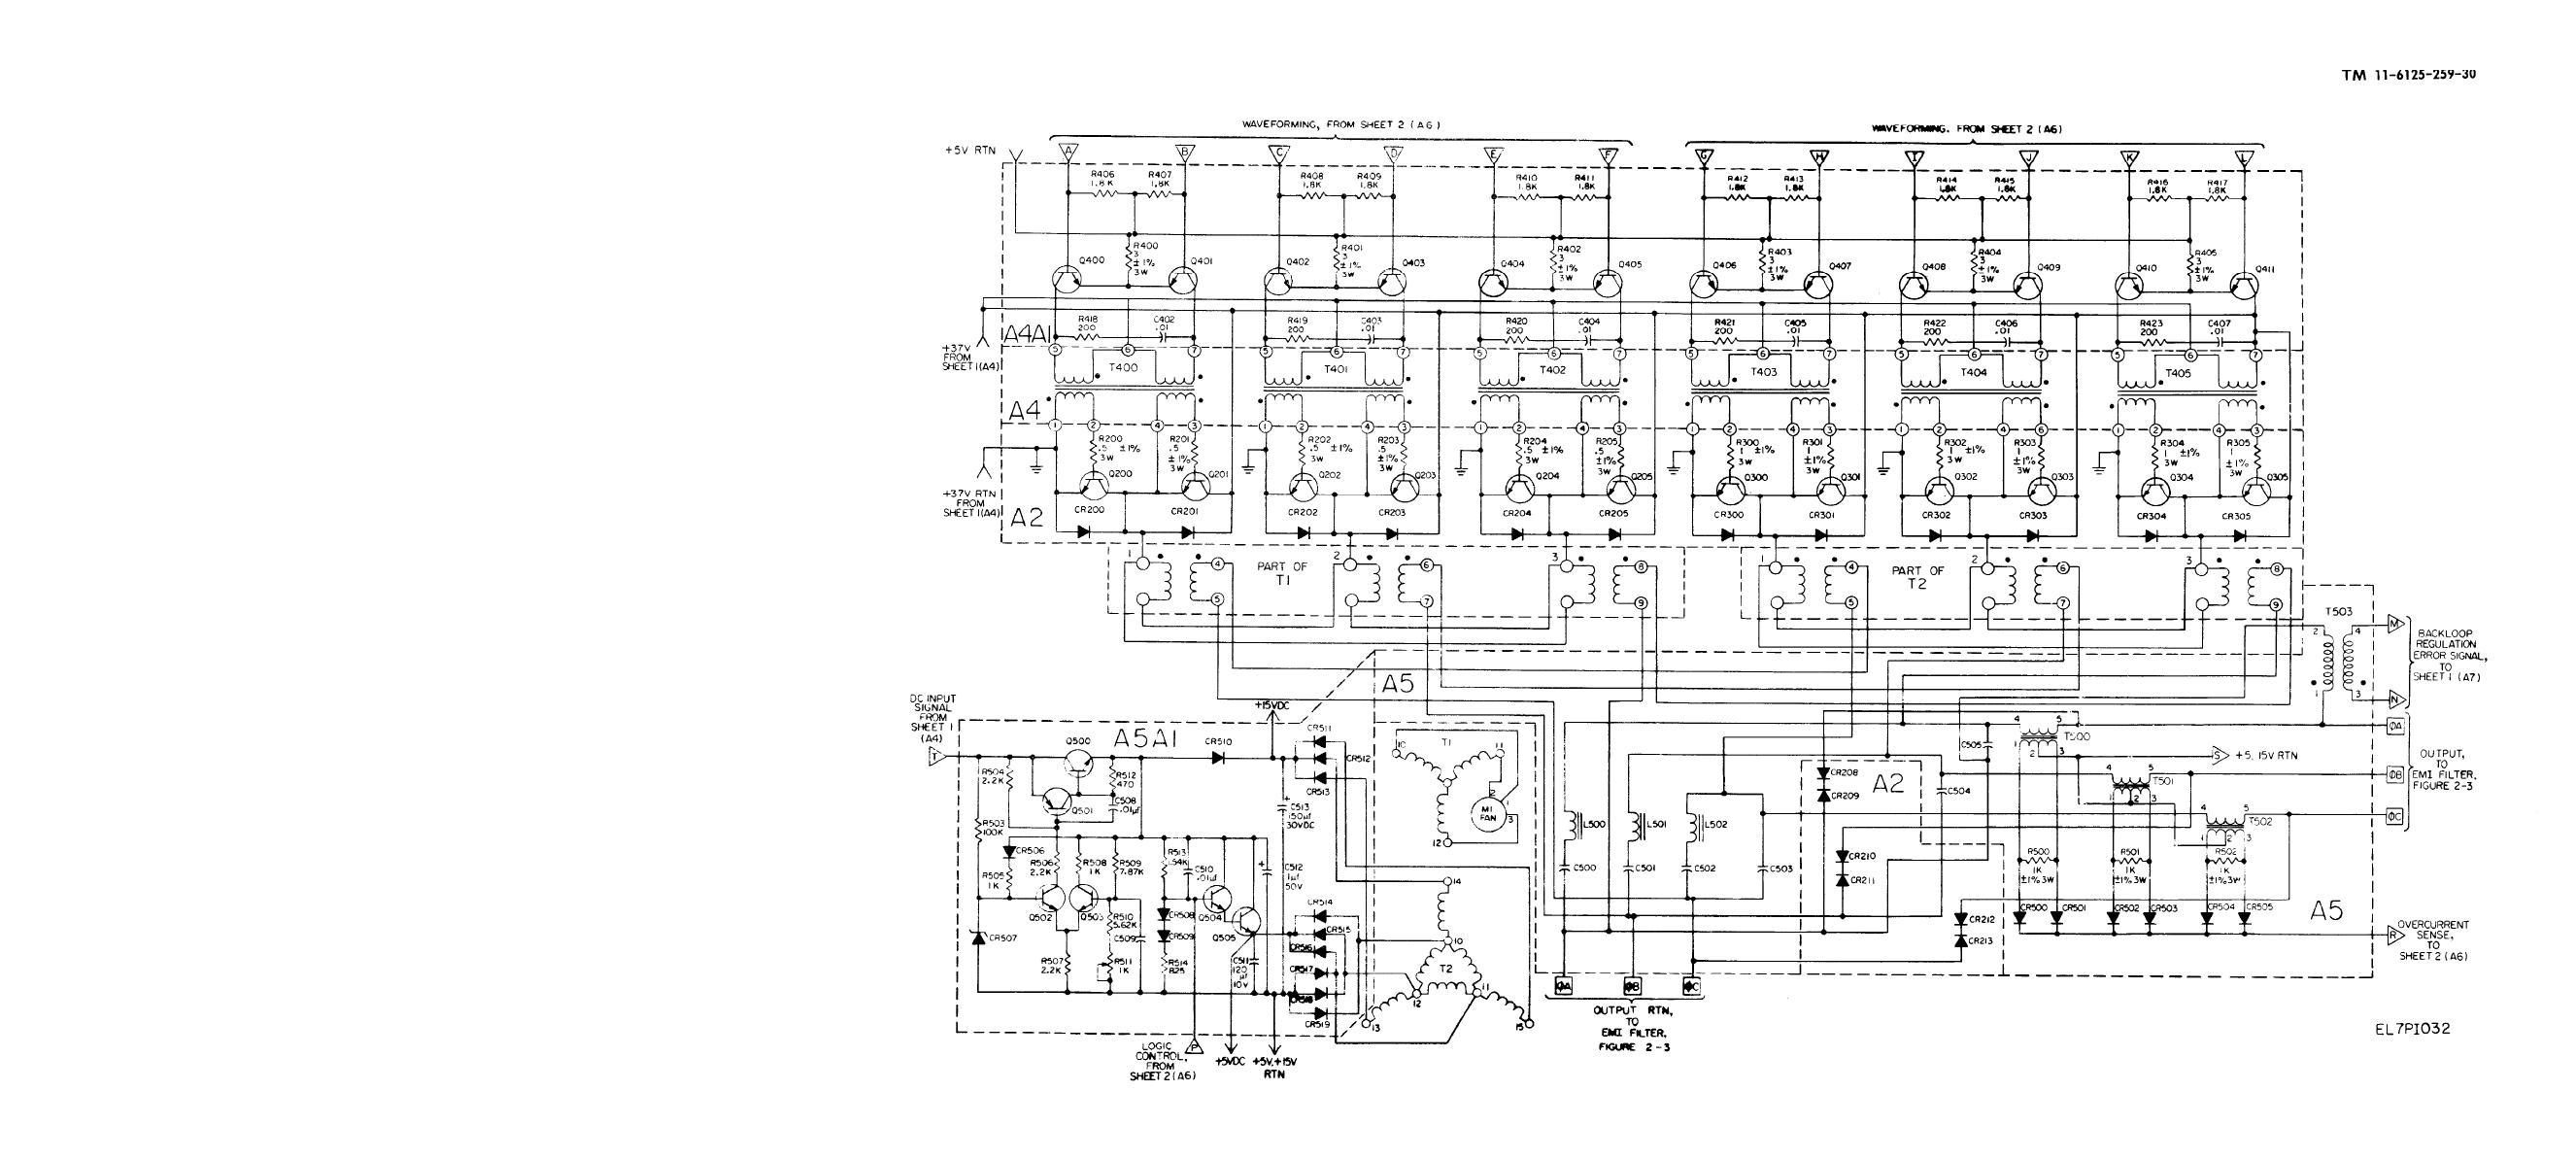 home ups inverter wiring diagram 2000 chevy blazer stock radio fo 2 schematic sheet 3 of